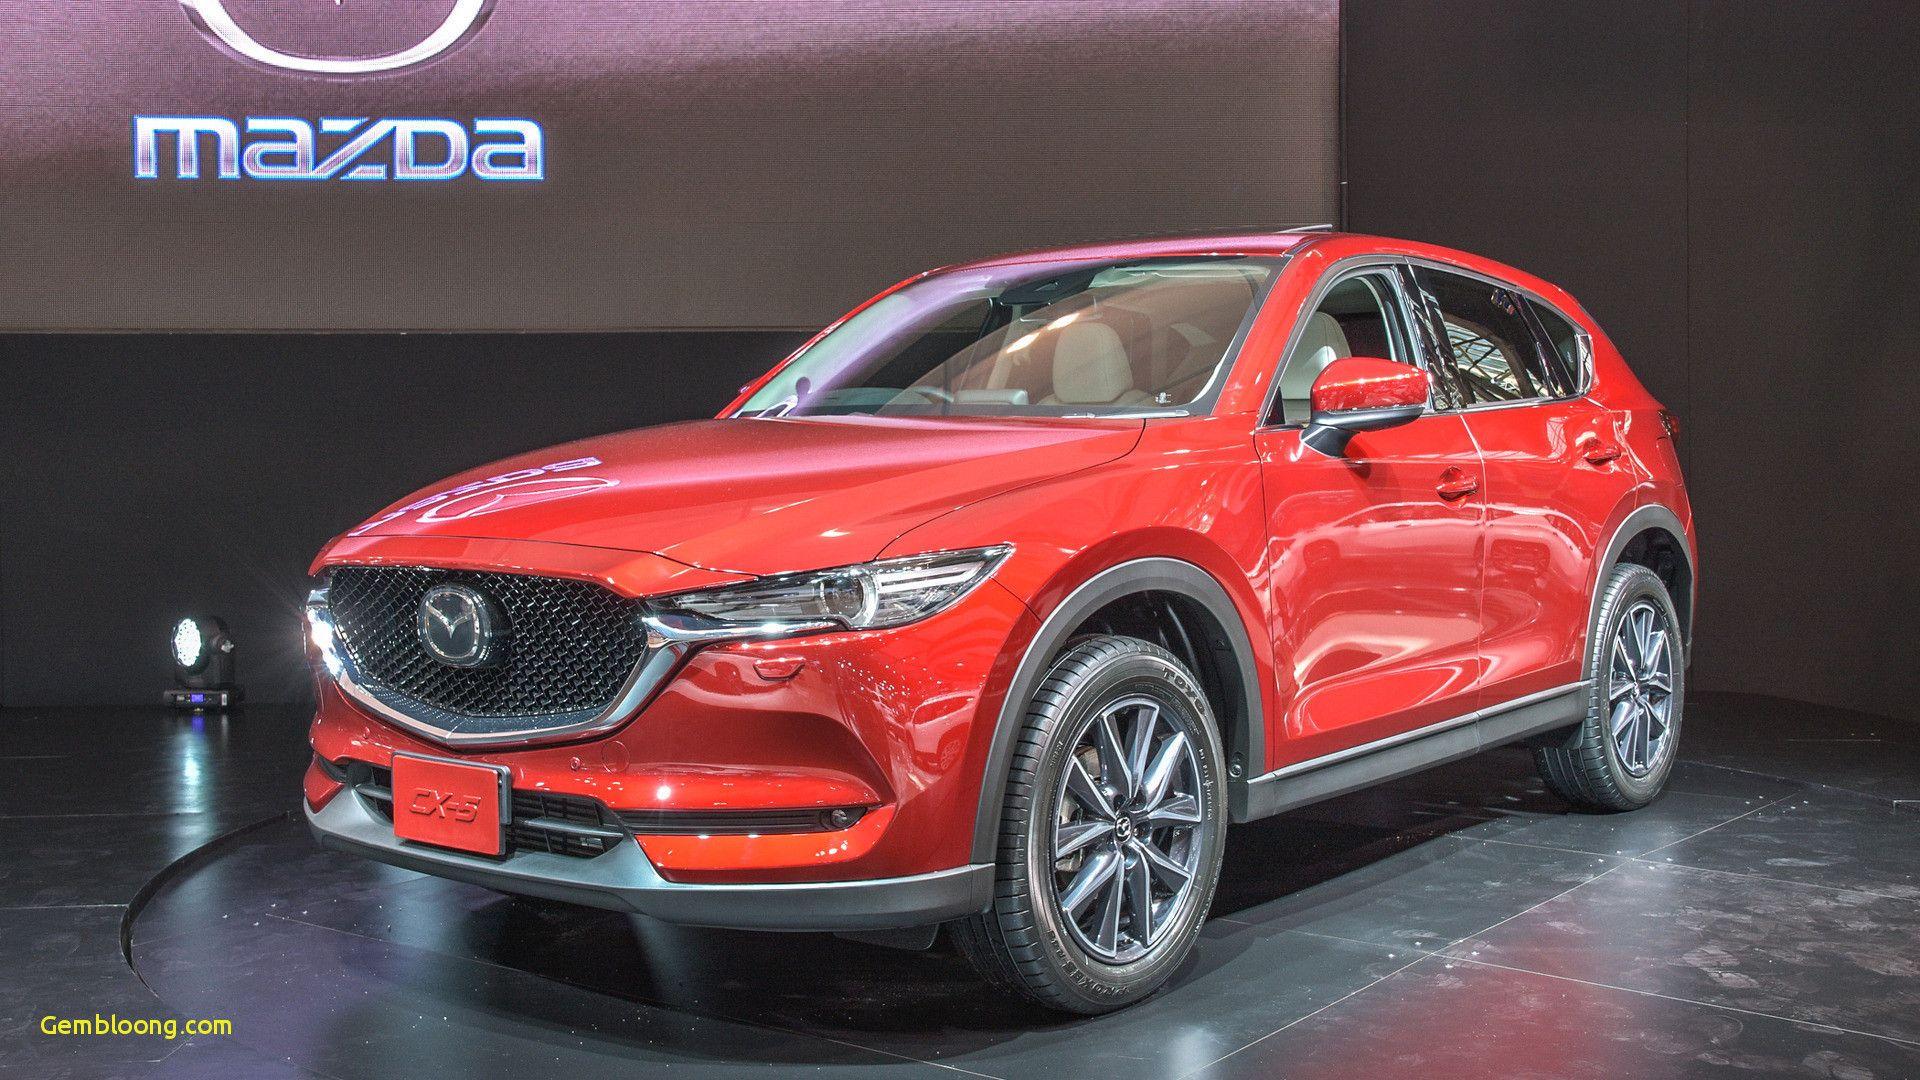 2020 Mazda Cx 9 2020 Mazda Cx 5 2019 Mazda Cx 5 Luxury Cars Hot 2019 Mazda Mazda Suv Lexus Sports Car